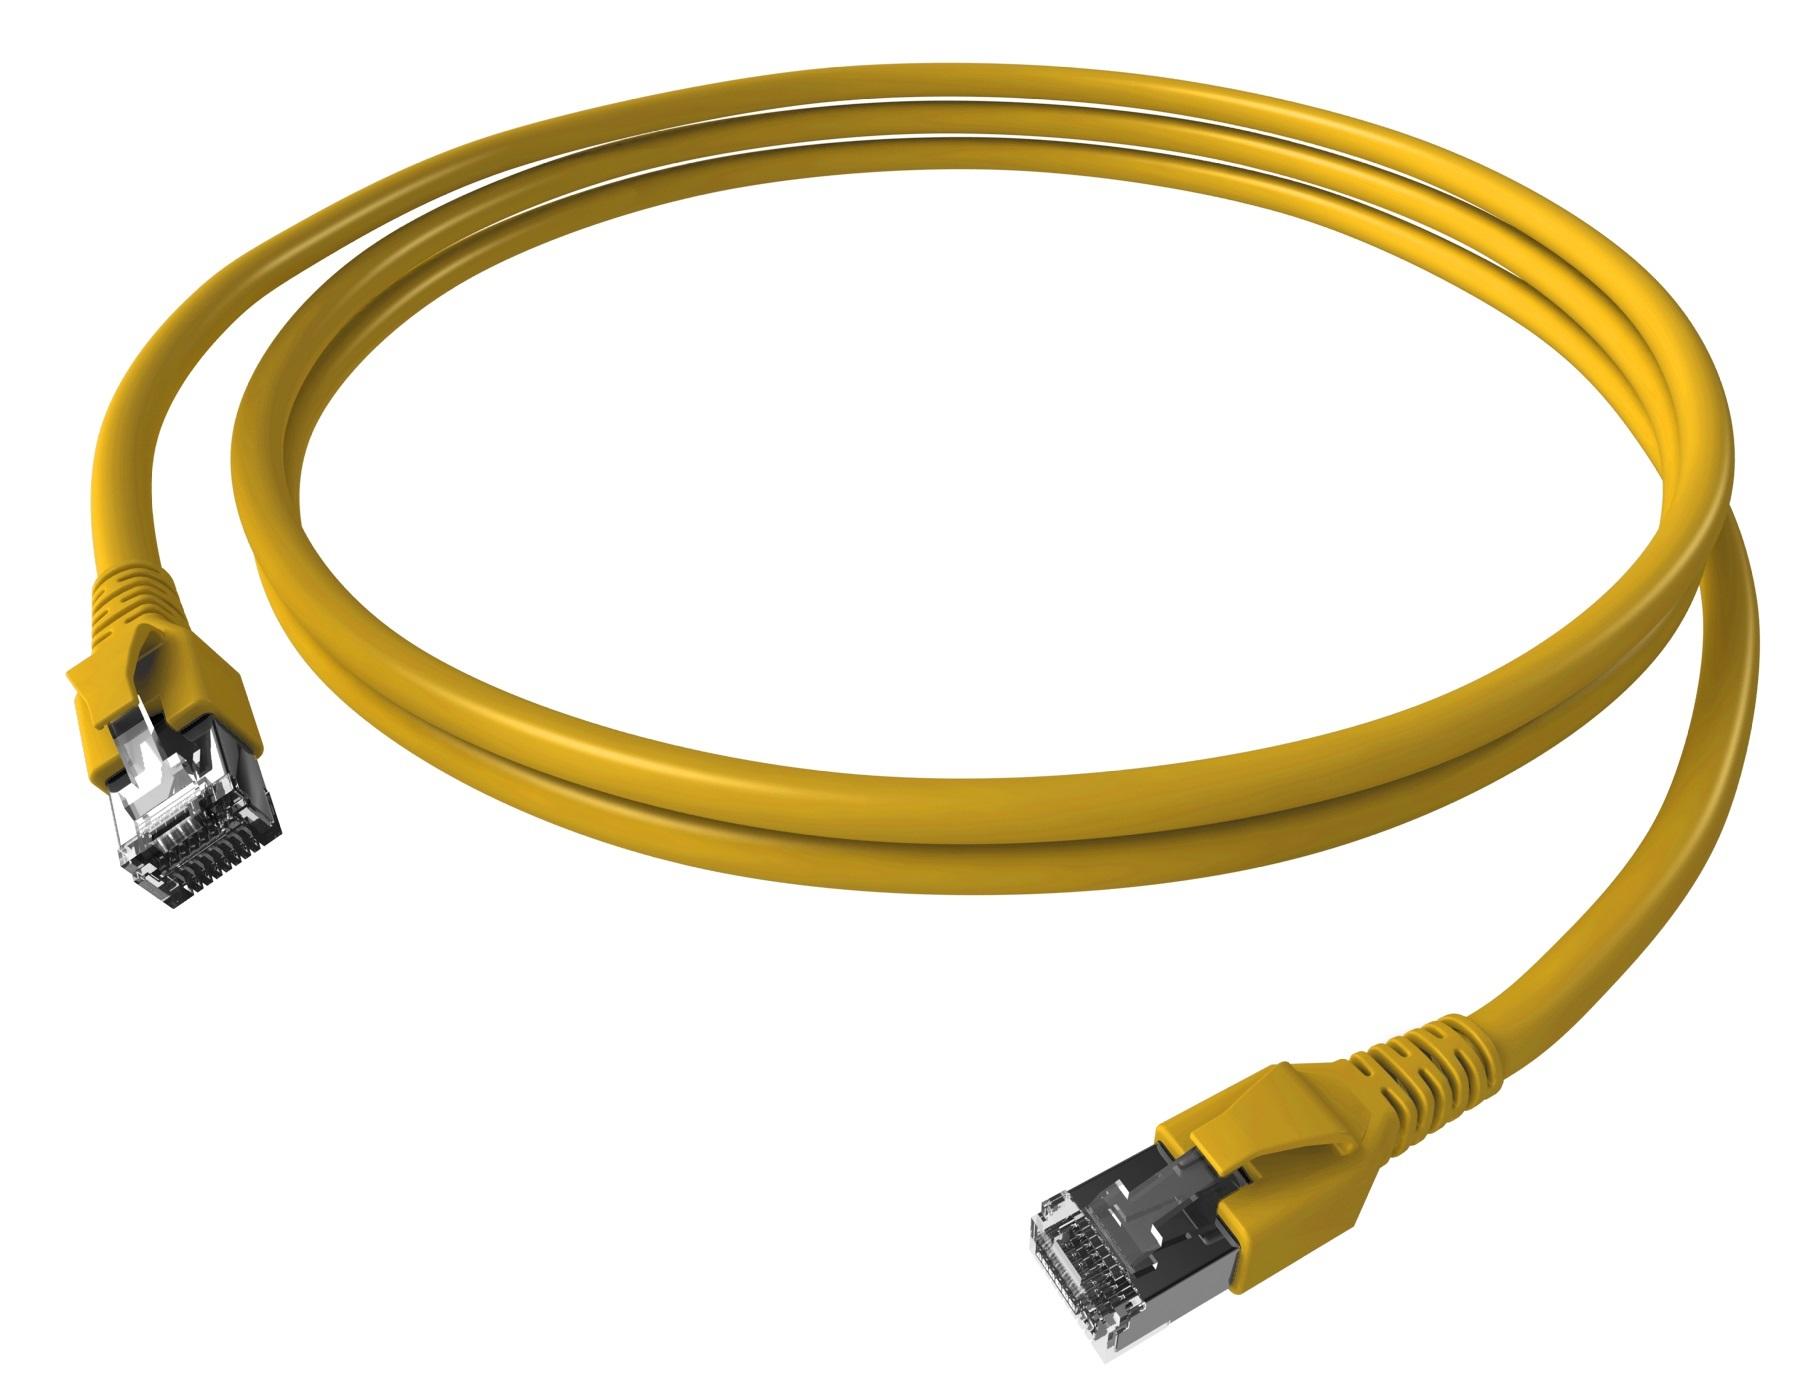 1 Stk Patchkabel RJ45 geschirmt Cat.6a 10GB, LS0H, gelb,  0,5m H6GTY00K5Y